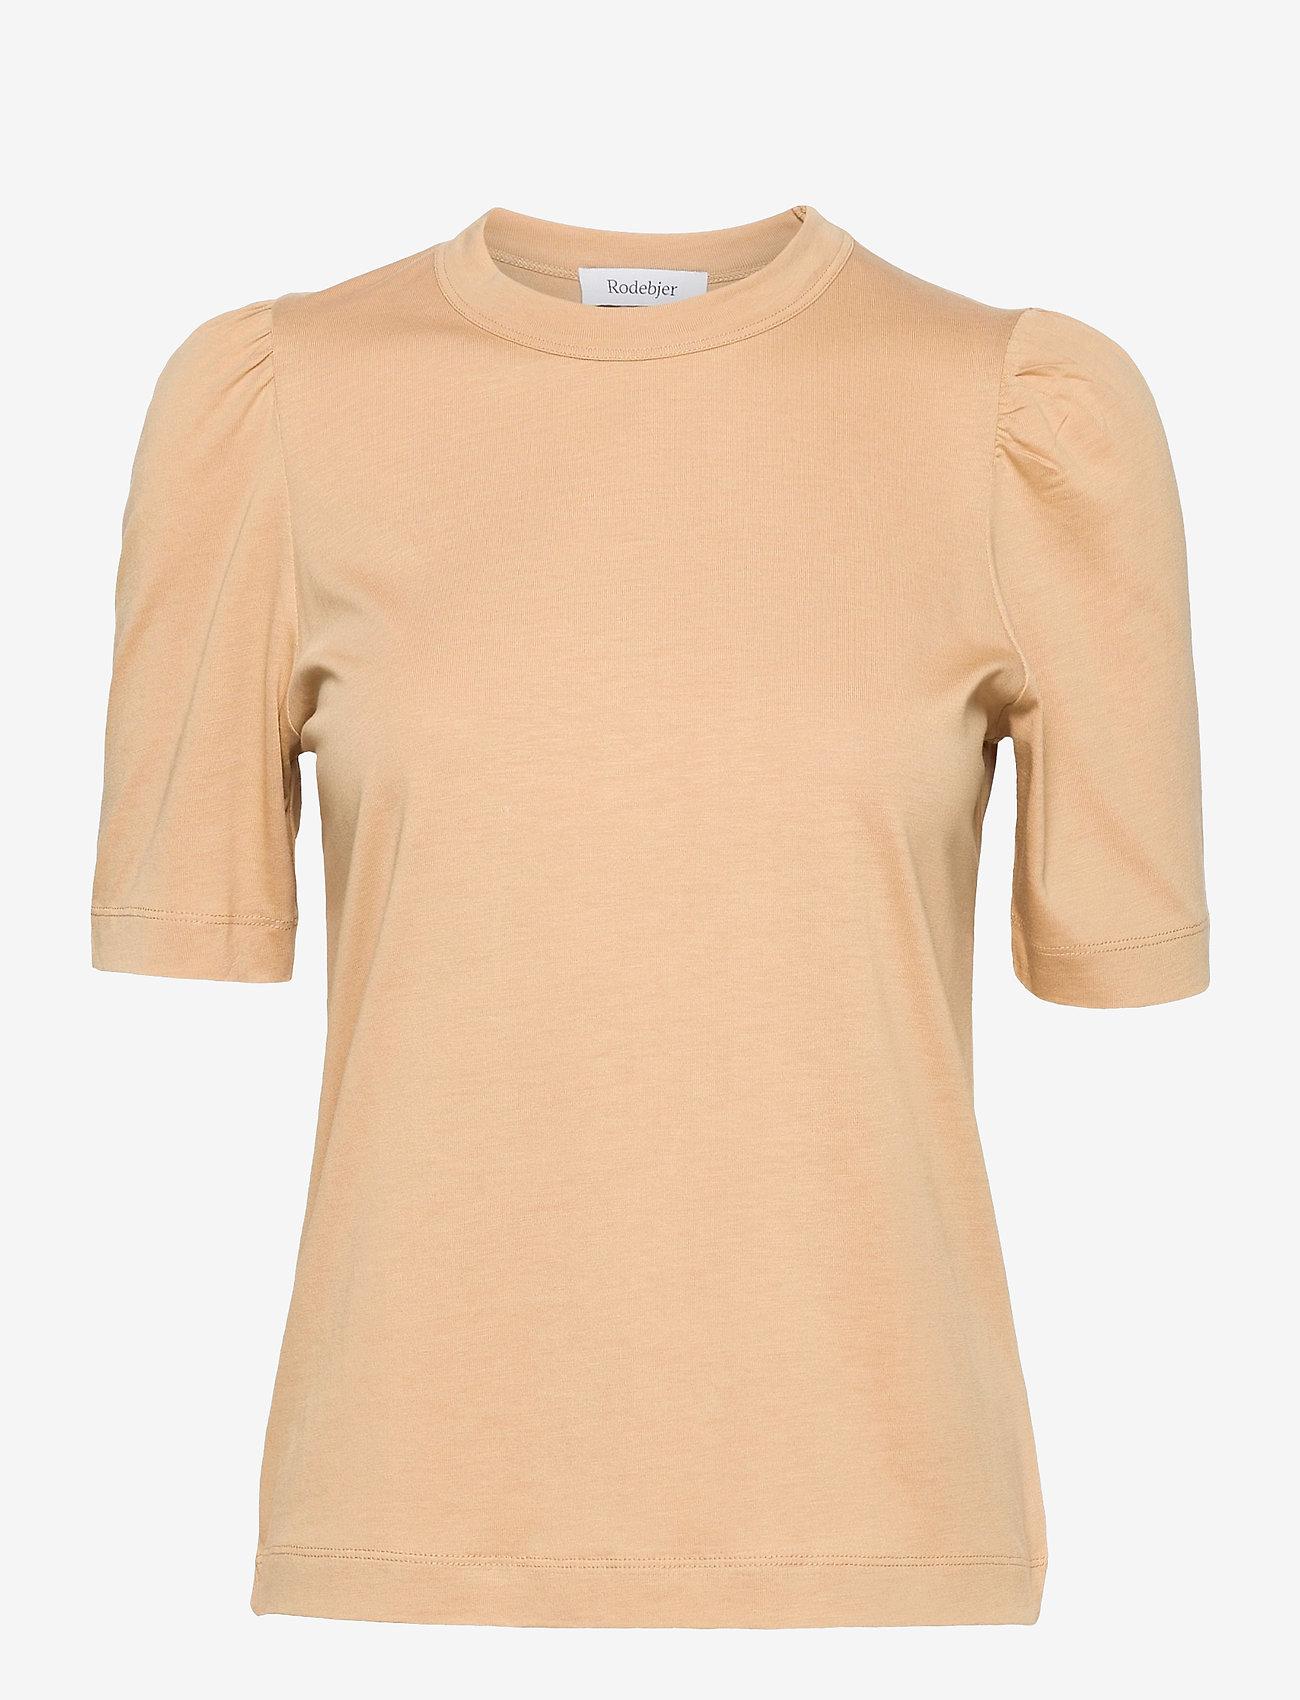 RODEBJER - RODEBJER DORY - t-shirts - camel - 0